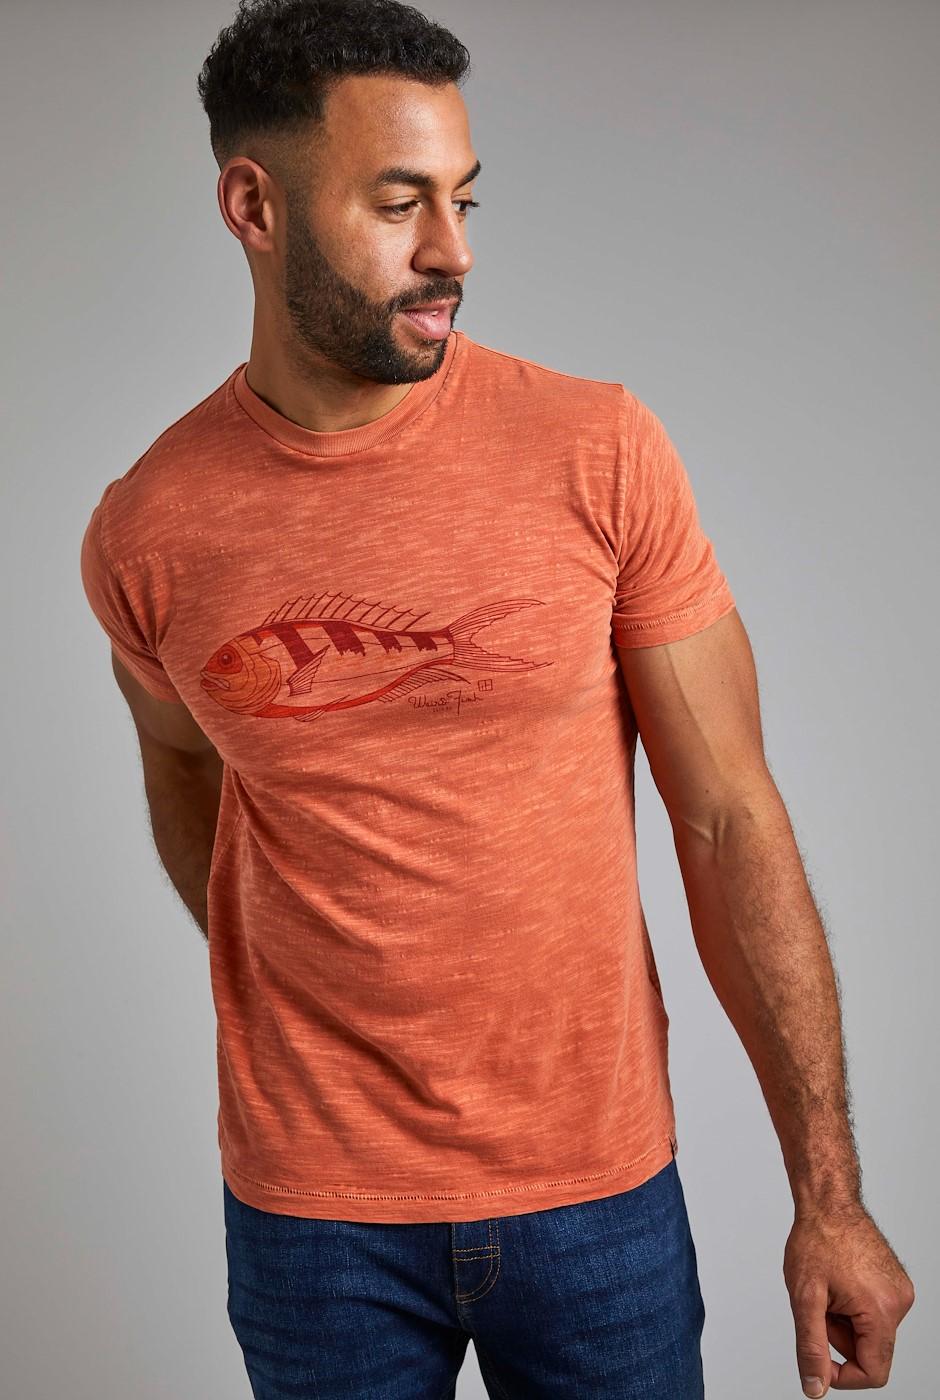 Raw Fish Organic Cotton Graphic T-Shirt Rust